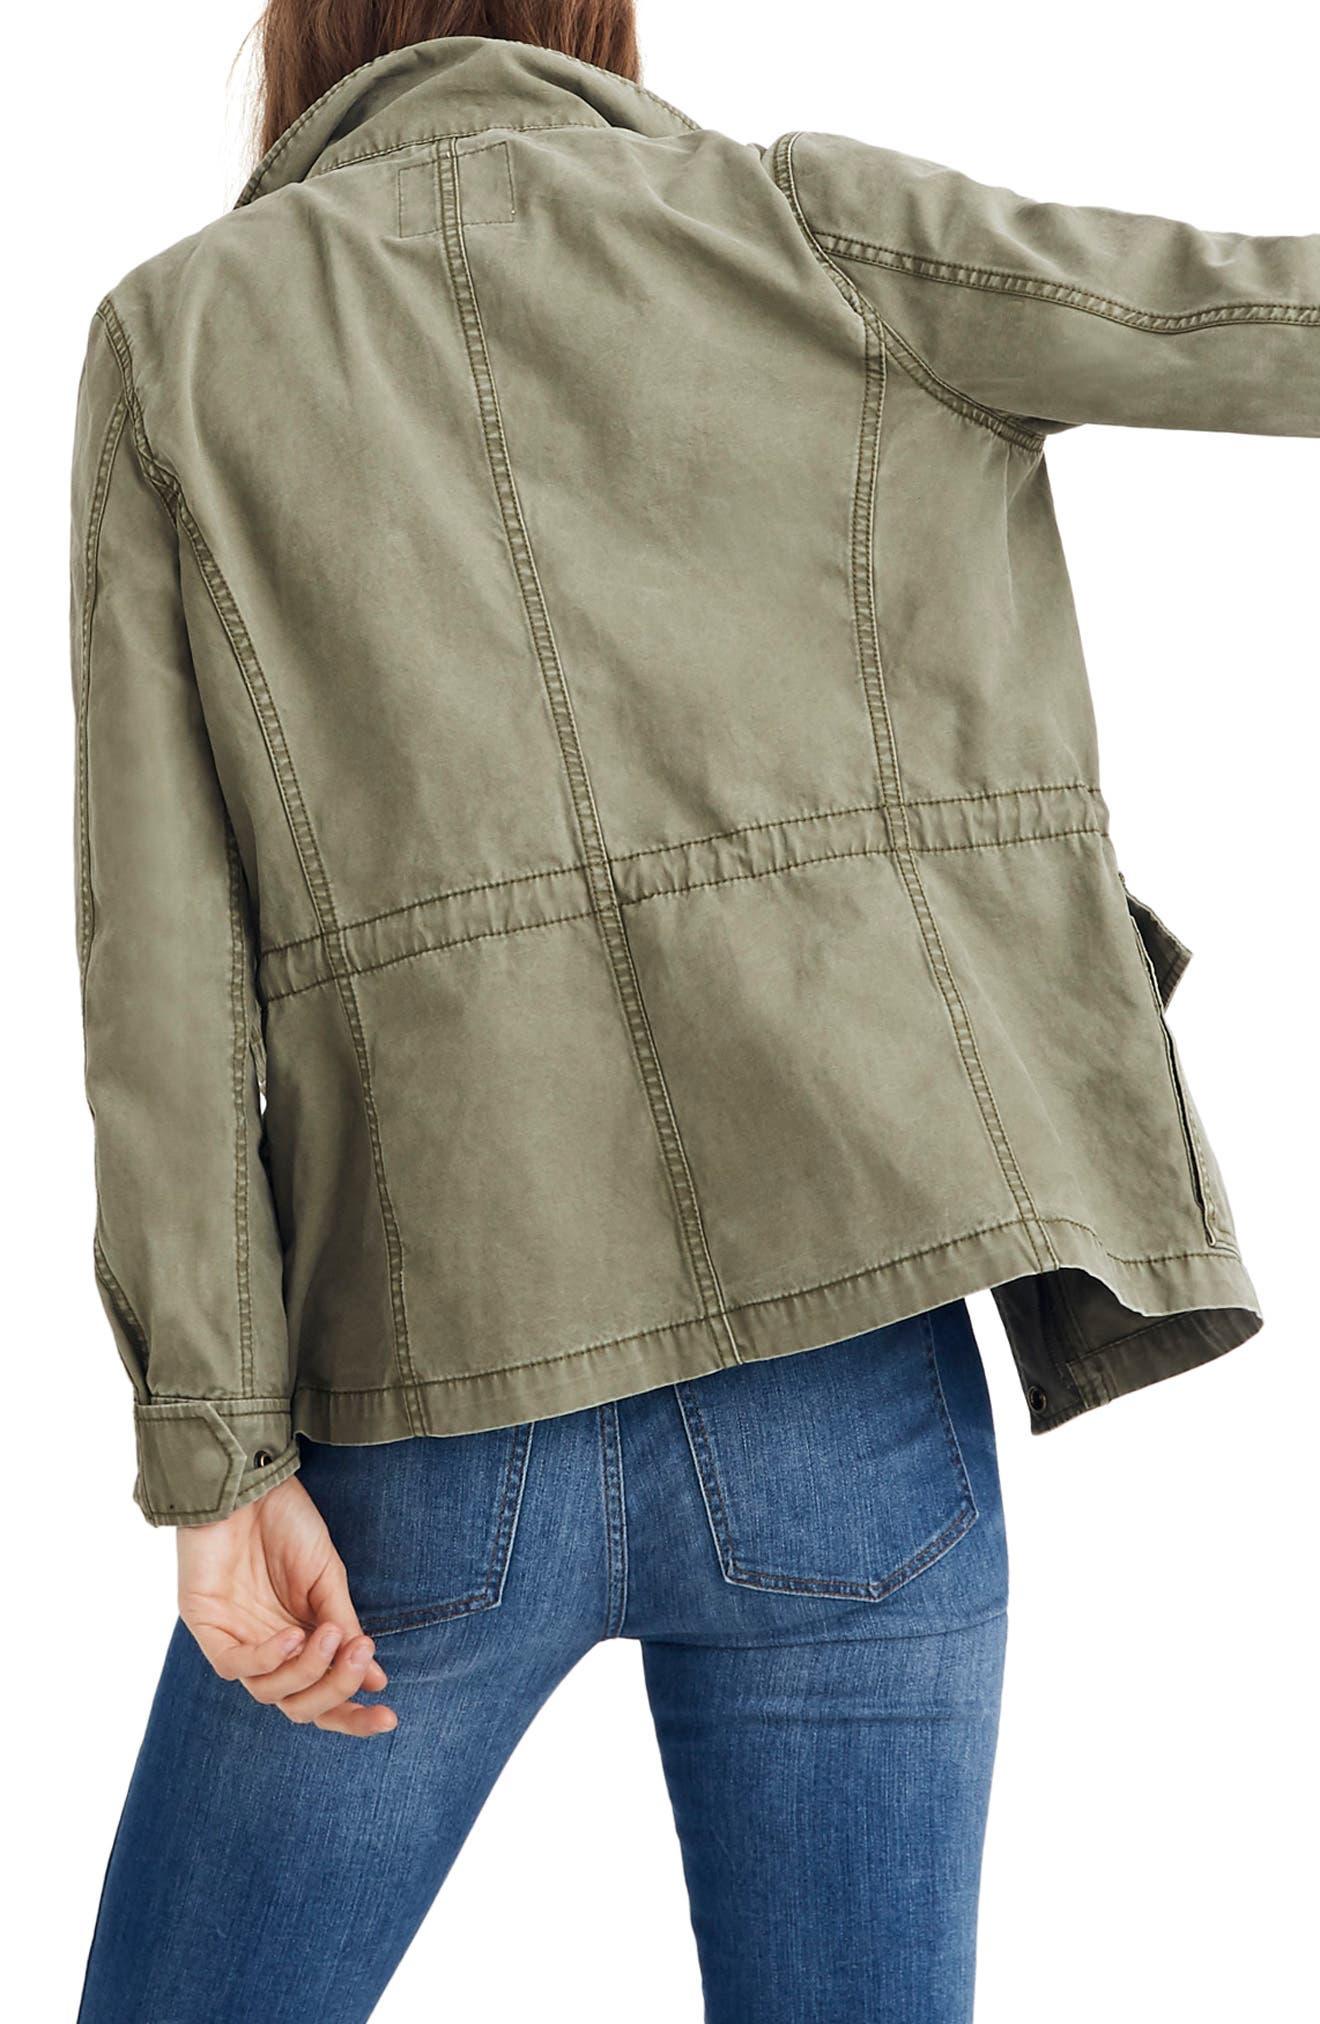 MADEWELL,                             Surplus Cotton Jacket,                             Alternate thumbnail 3, color,                             DESERT OLIVE